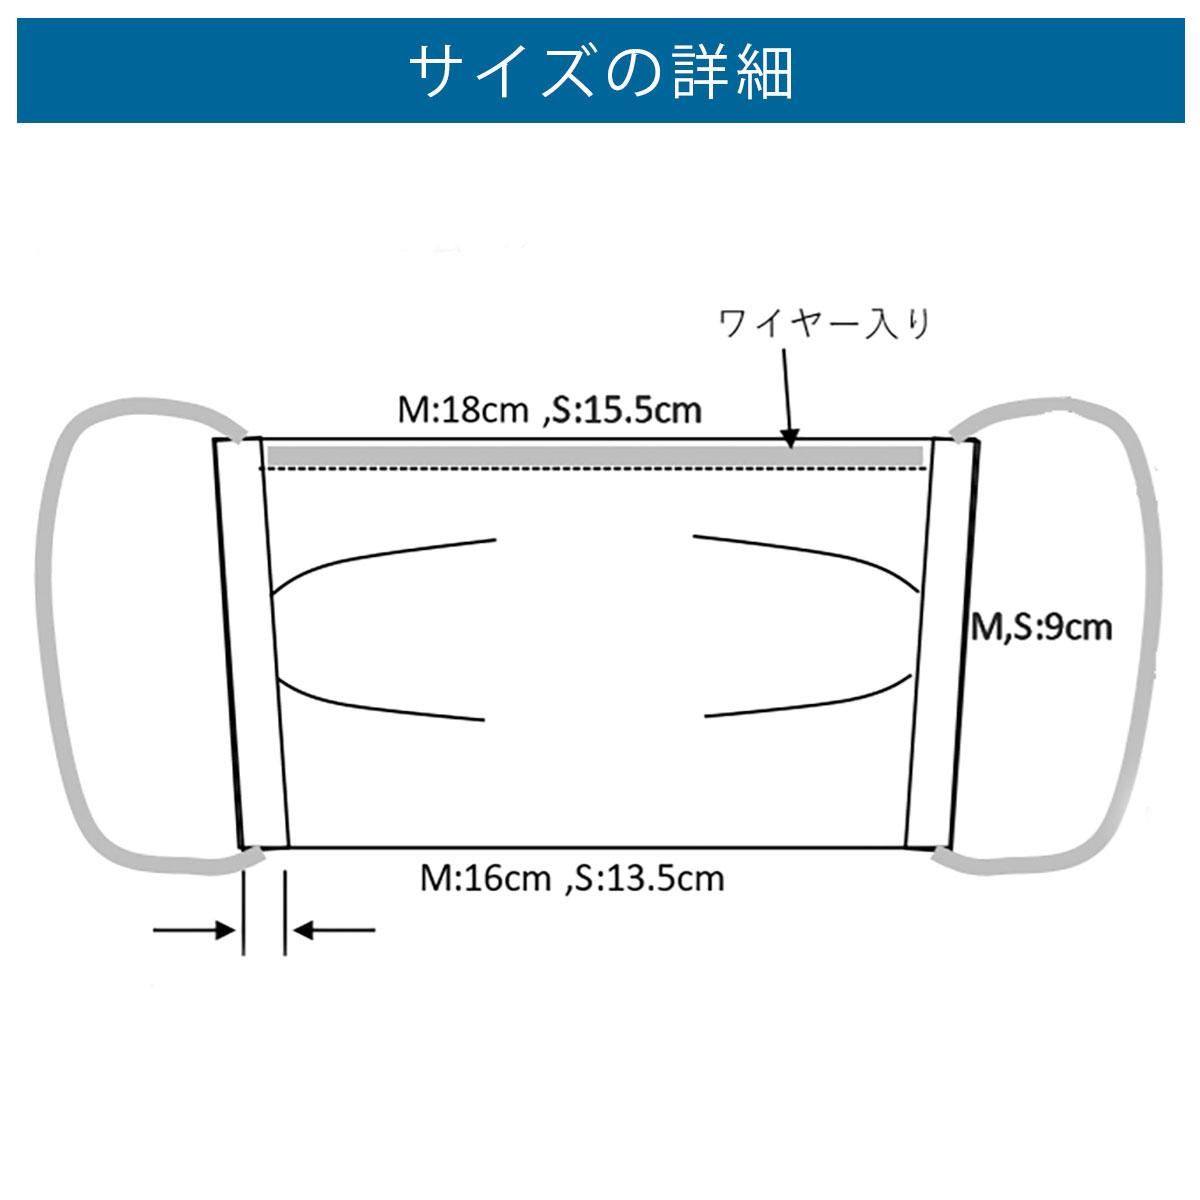 Cadeauya【ガーゼマスク】送料全国300円 リネン100% S/Mサイズ メンズレディース兼用 日本製 大人用